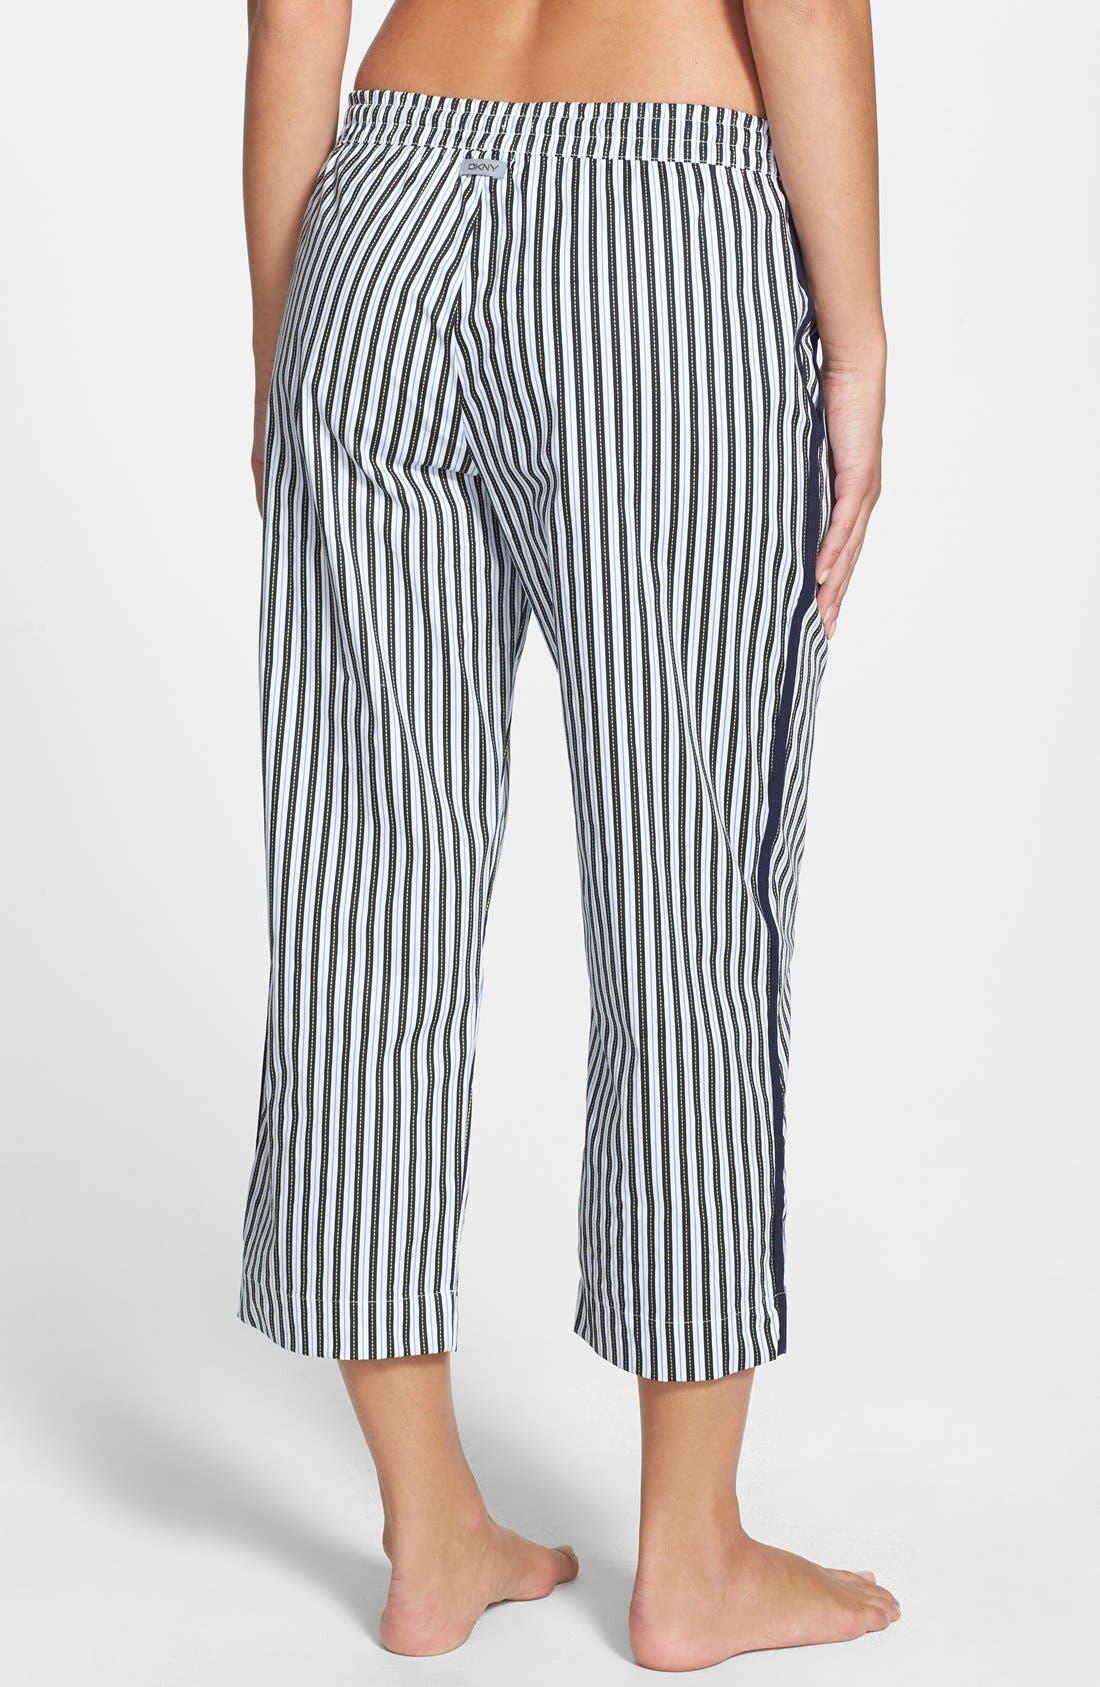 Alternate Image 2  - DKNY 'Seaside Bliss' Cotton Capri Pants